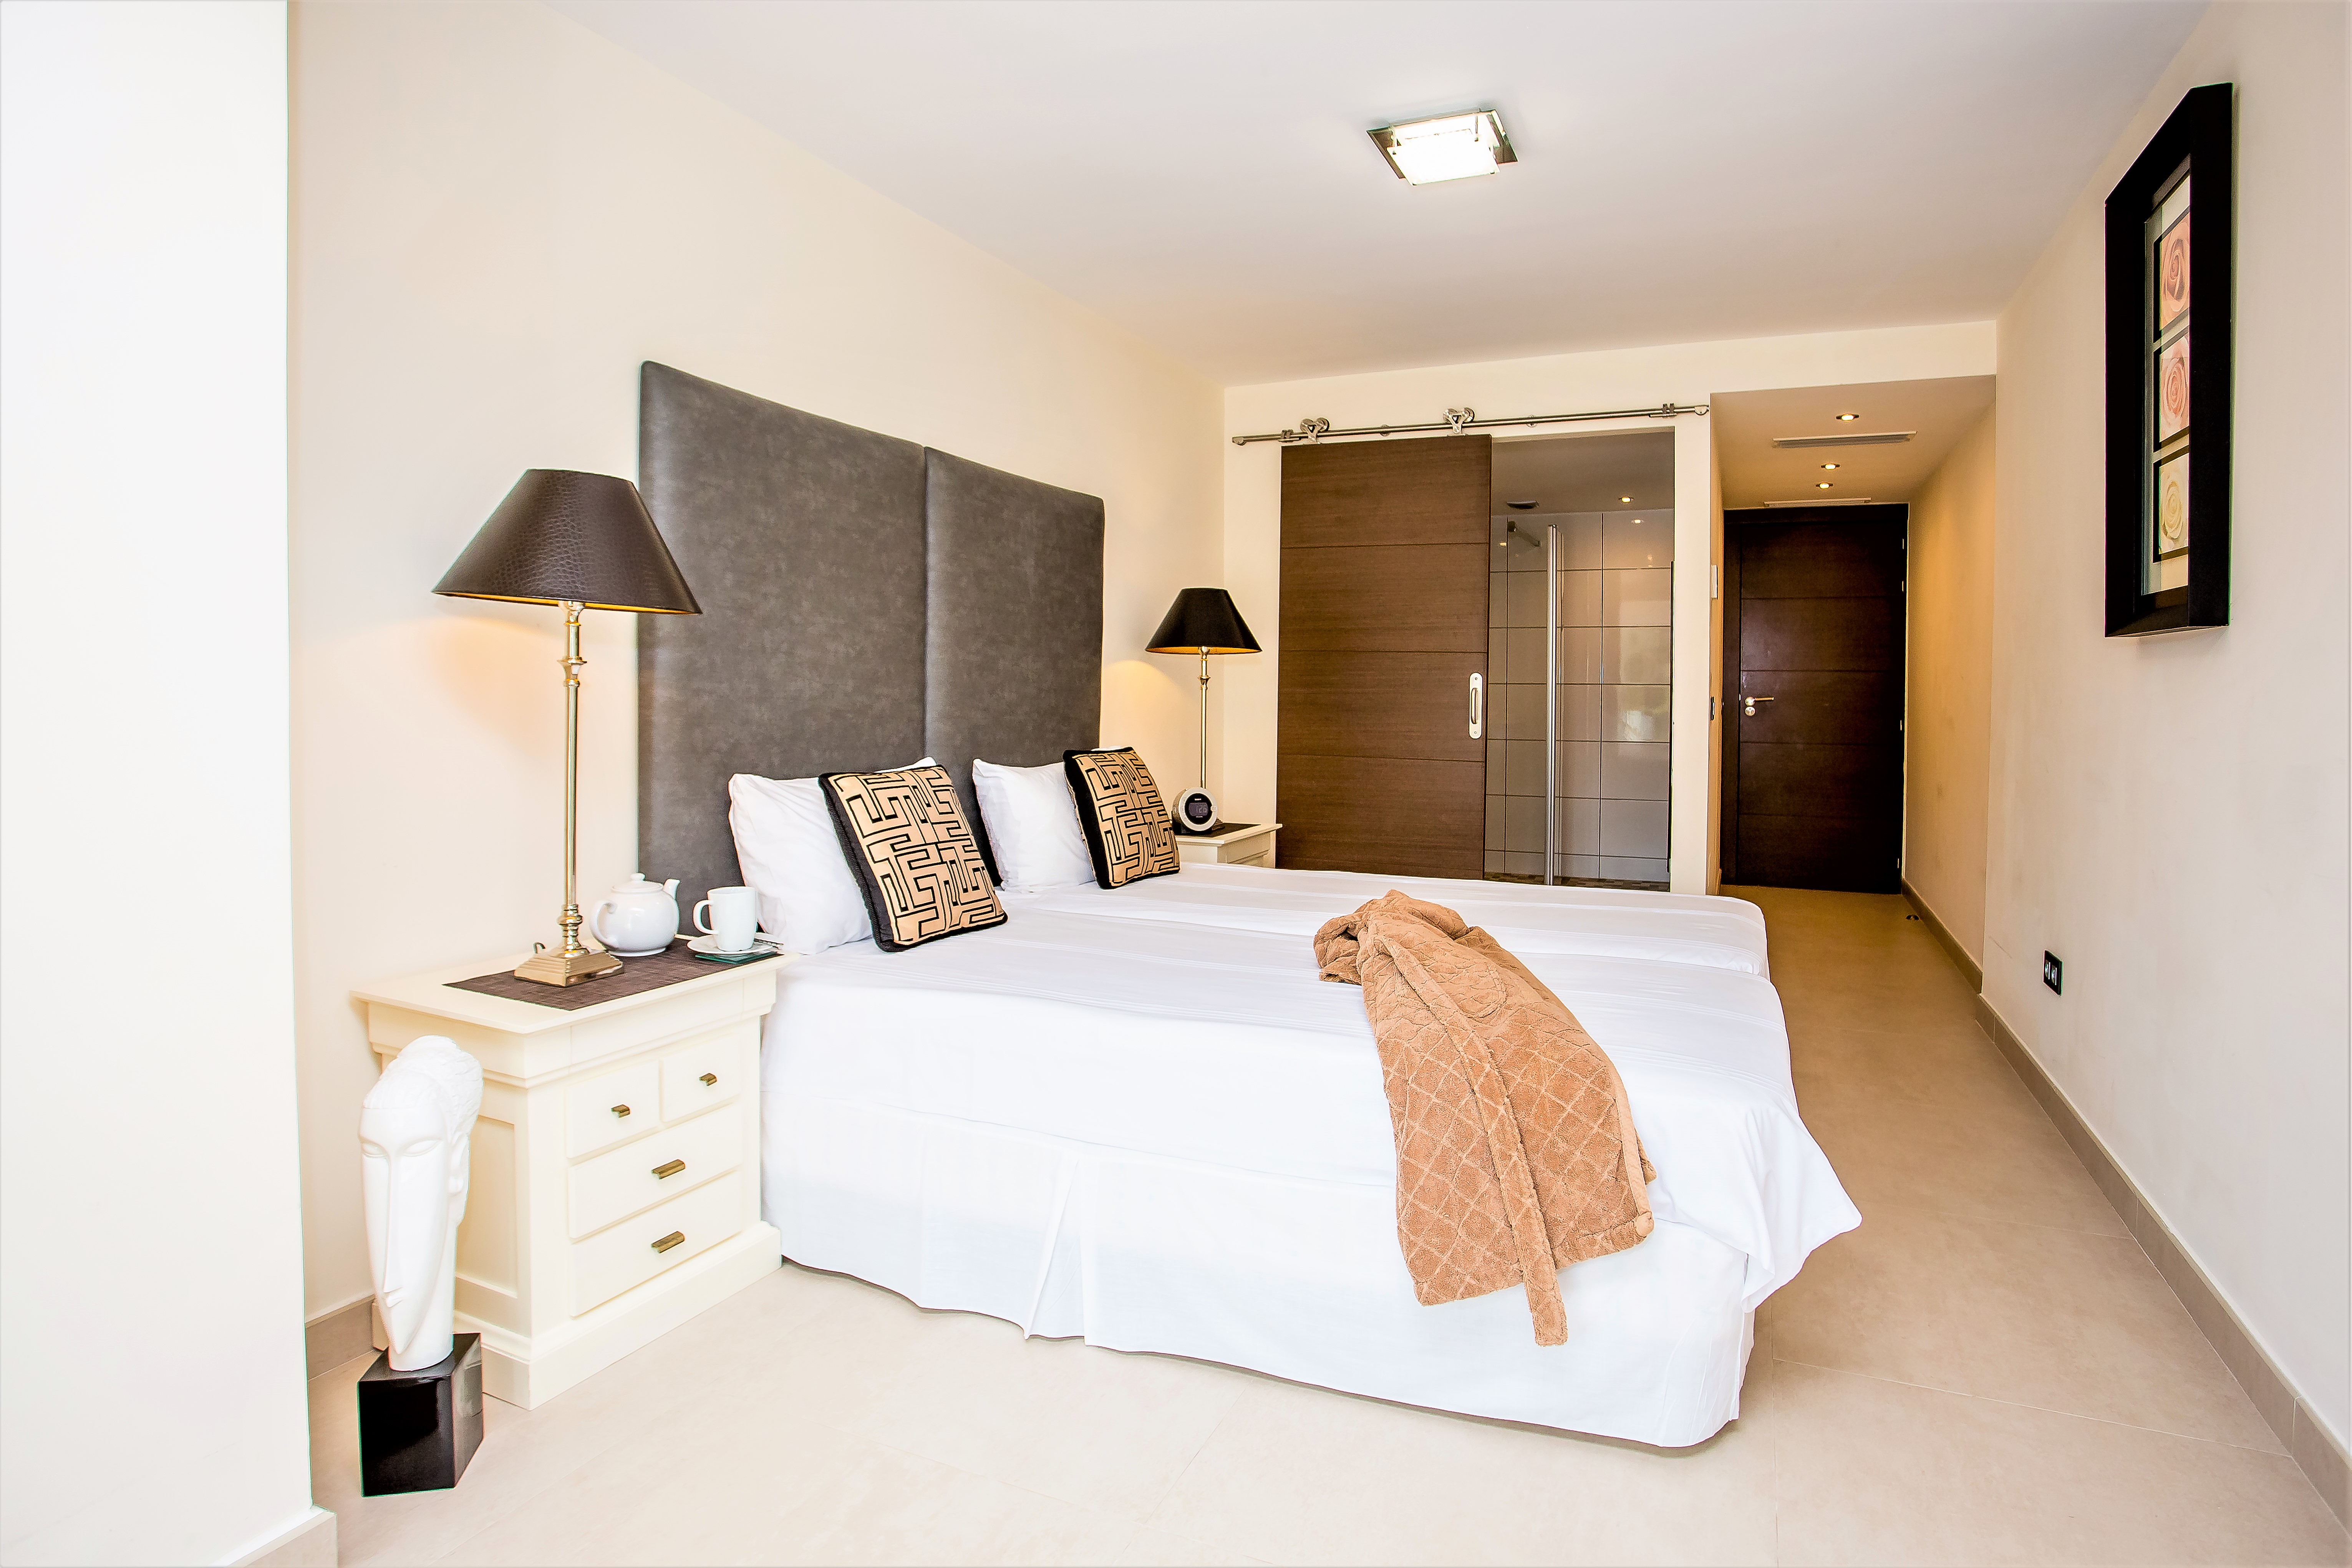 Apartment 8 Bedroom VILLA BY PUERTO BANUS   SEA 5 min                                photo 16856231